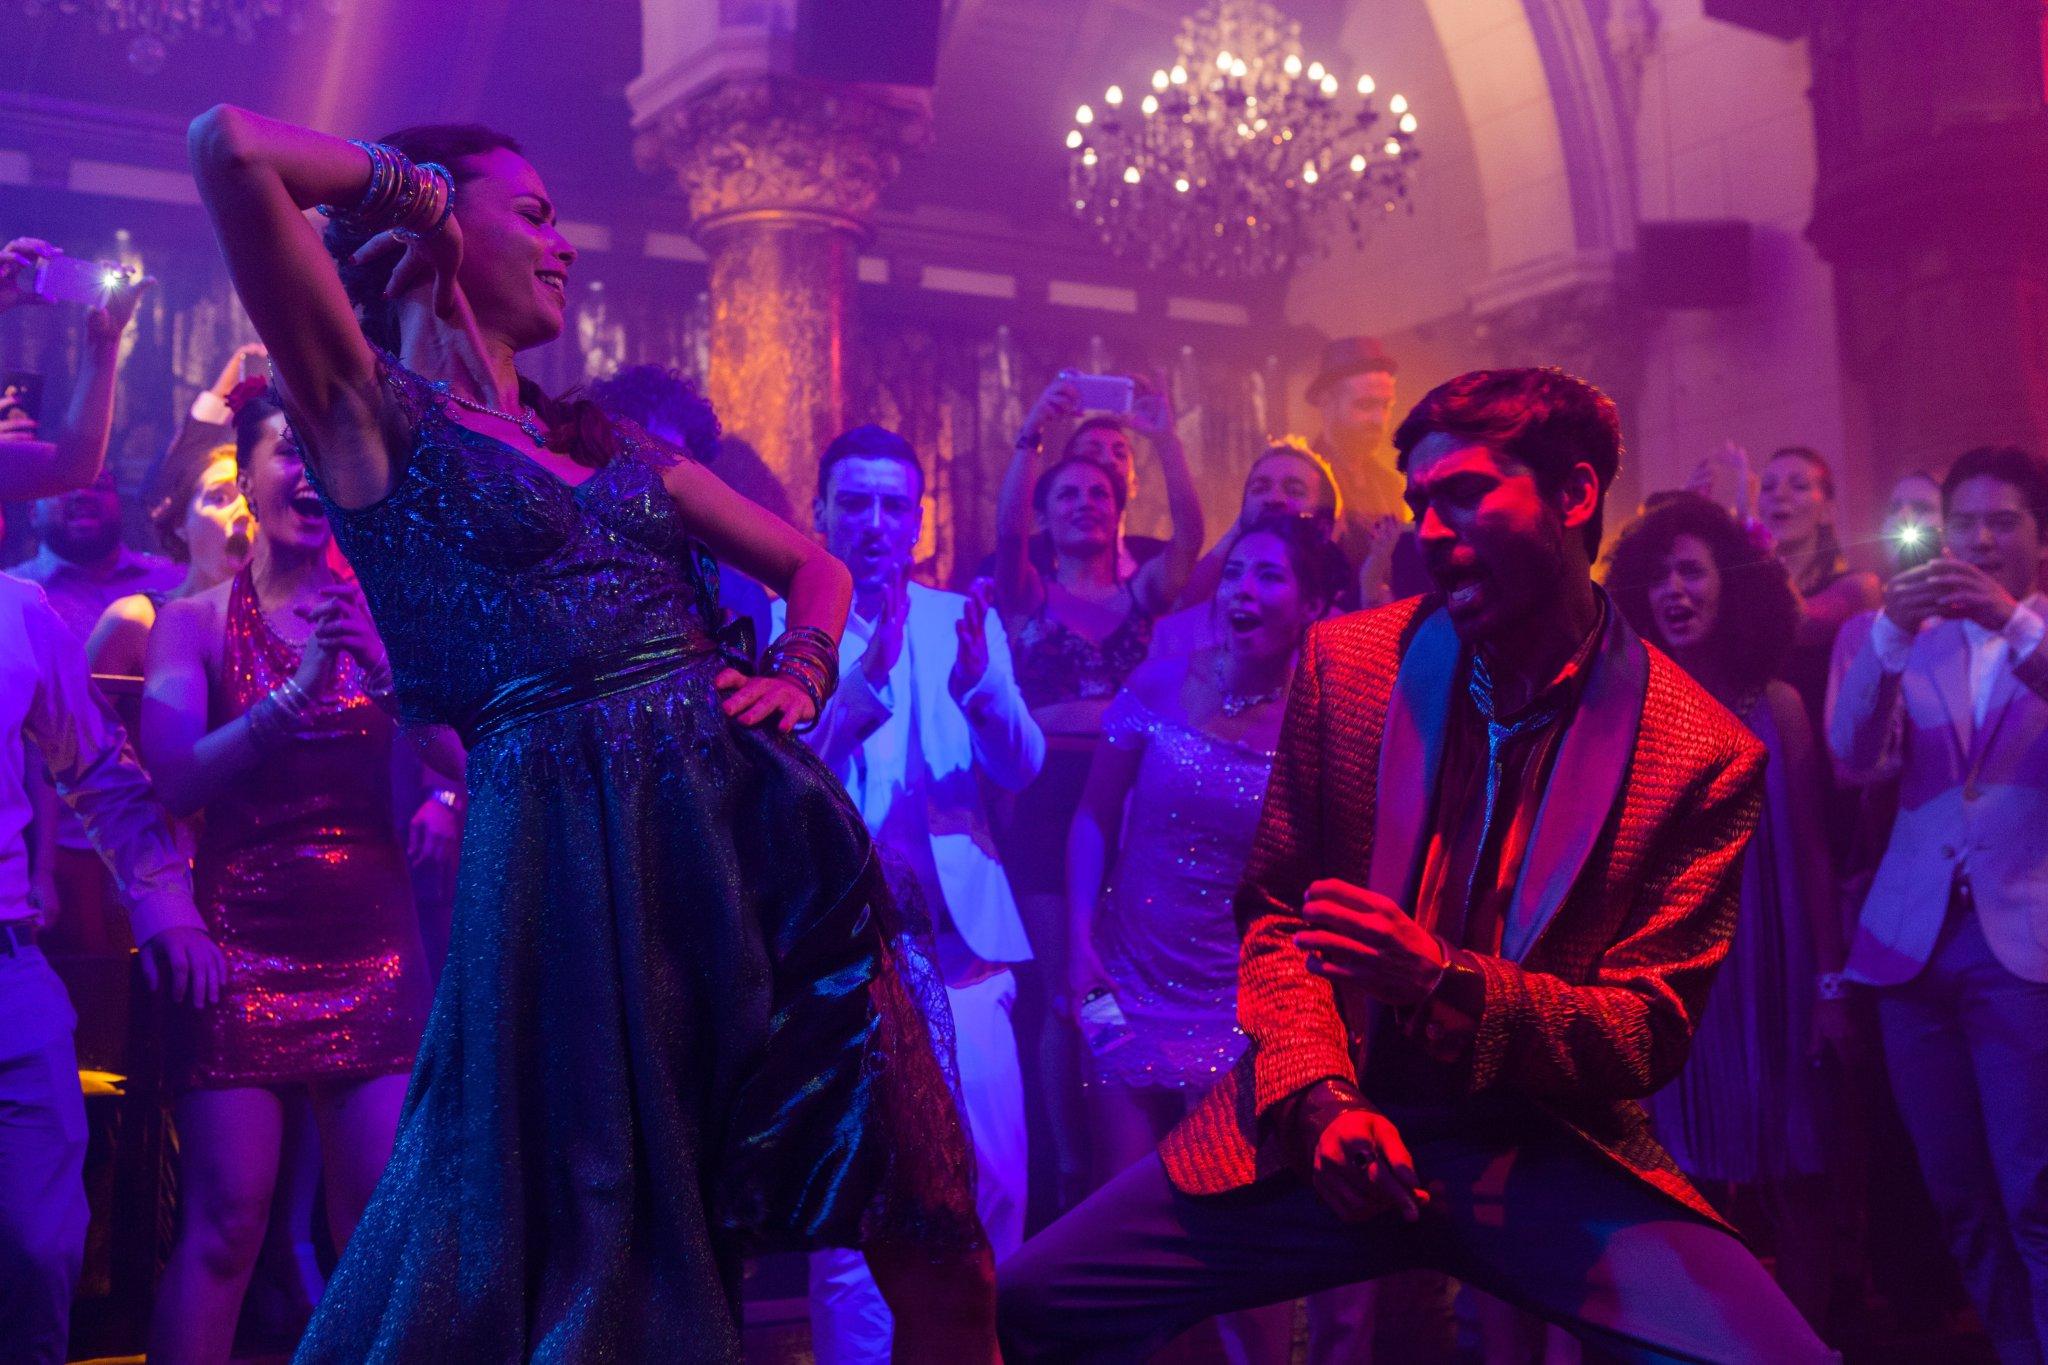 Pakkiri Movie Review: Dhanush as Fakir Delivers a Light Hearted Adventurous Entertainment